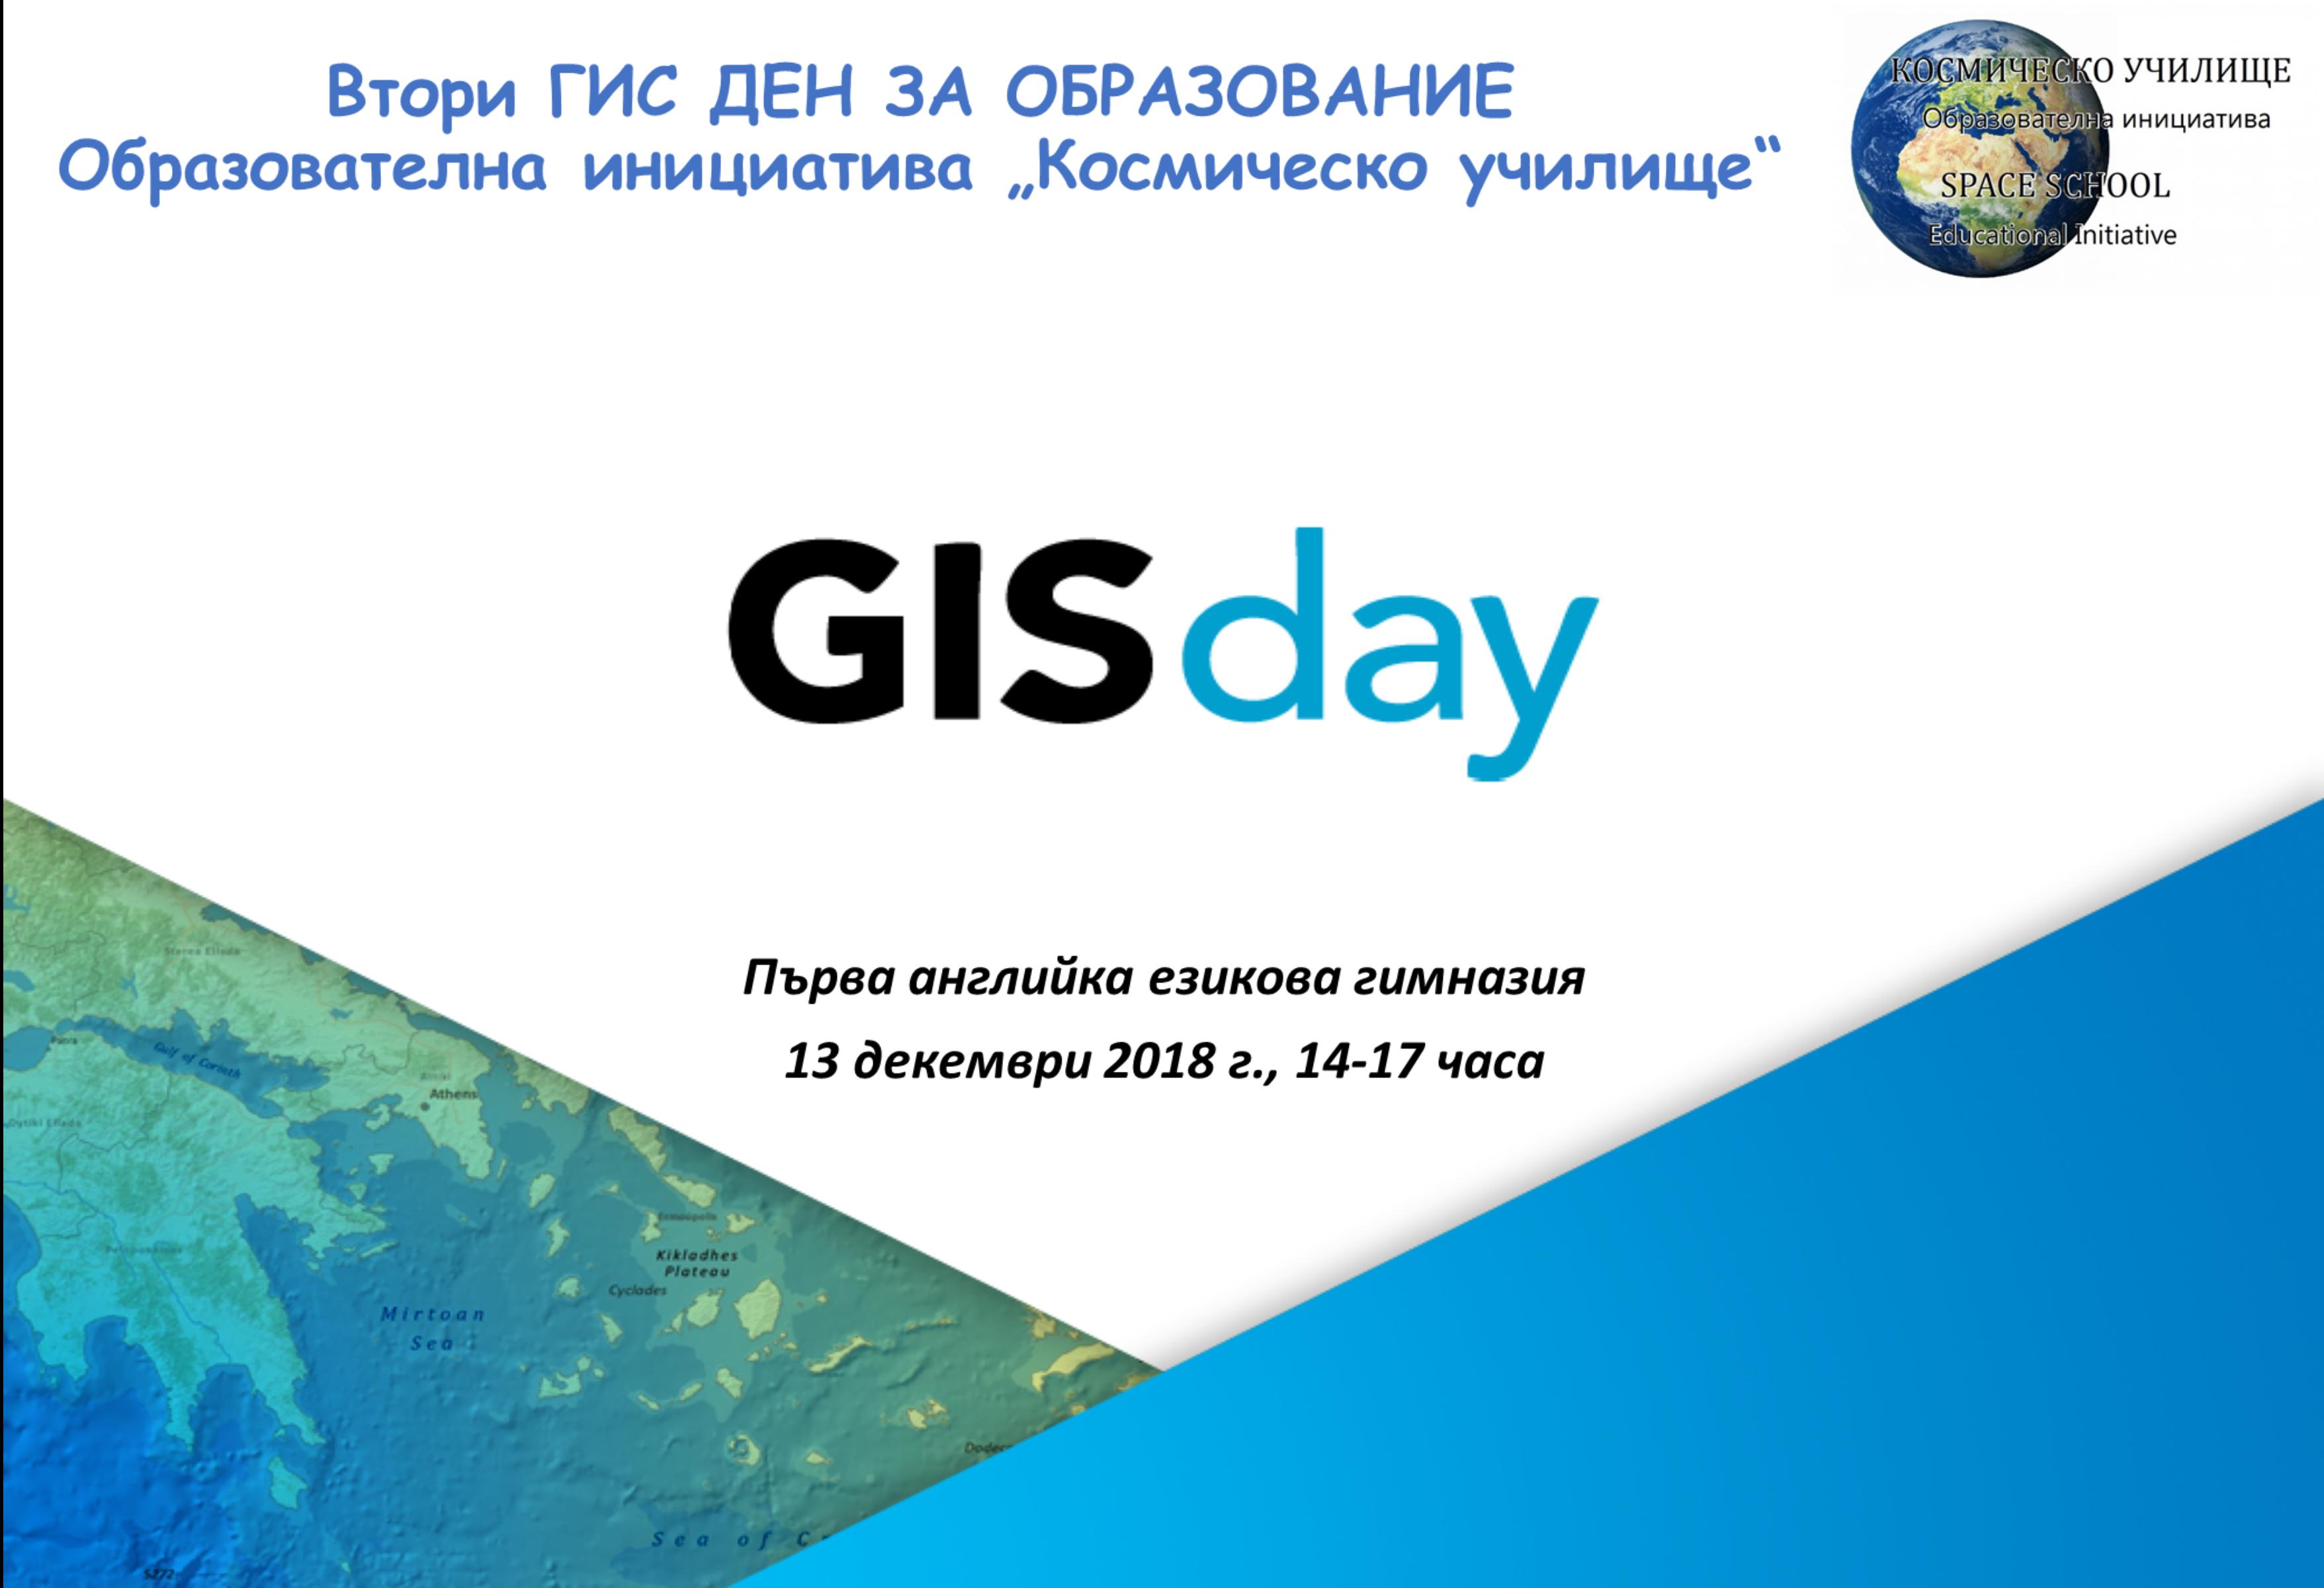 Permalink to:Втори ГИС ден за образование